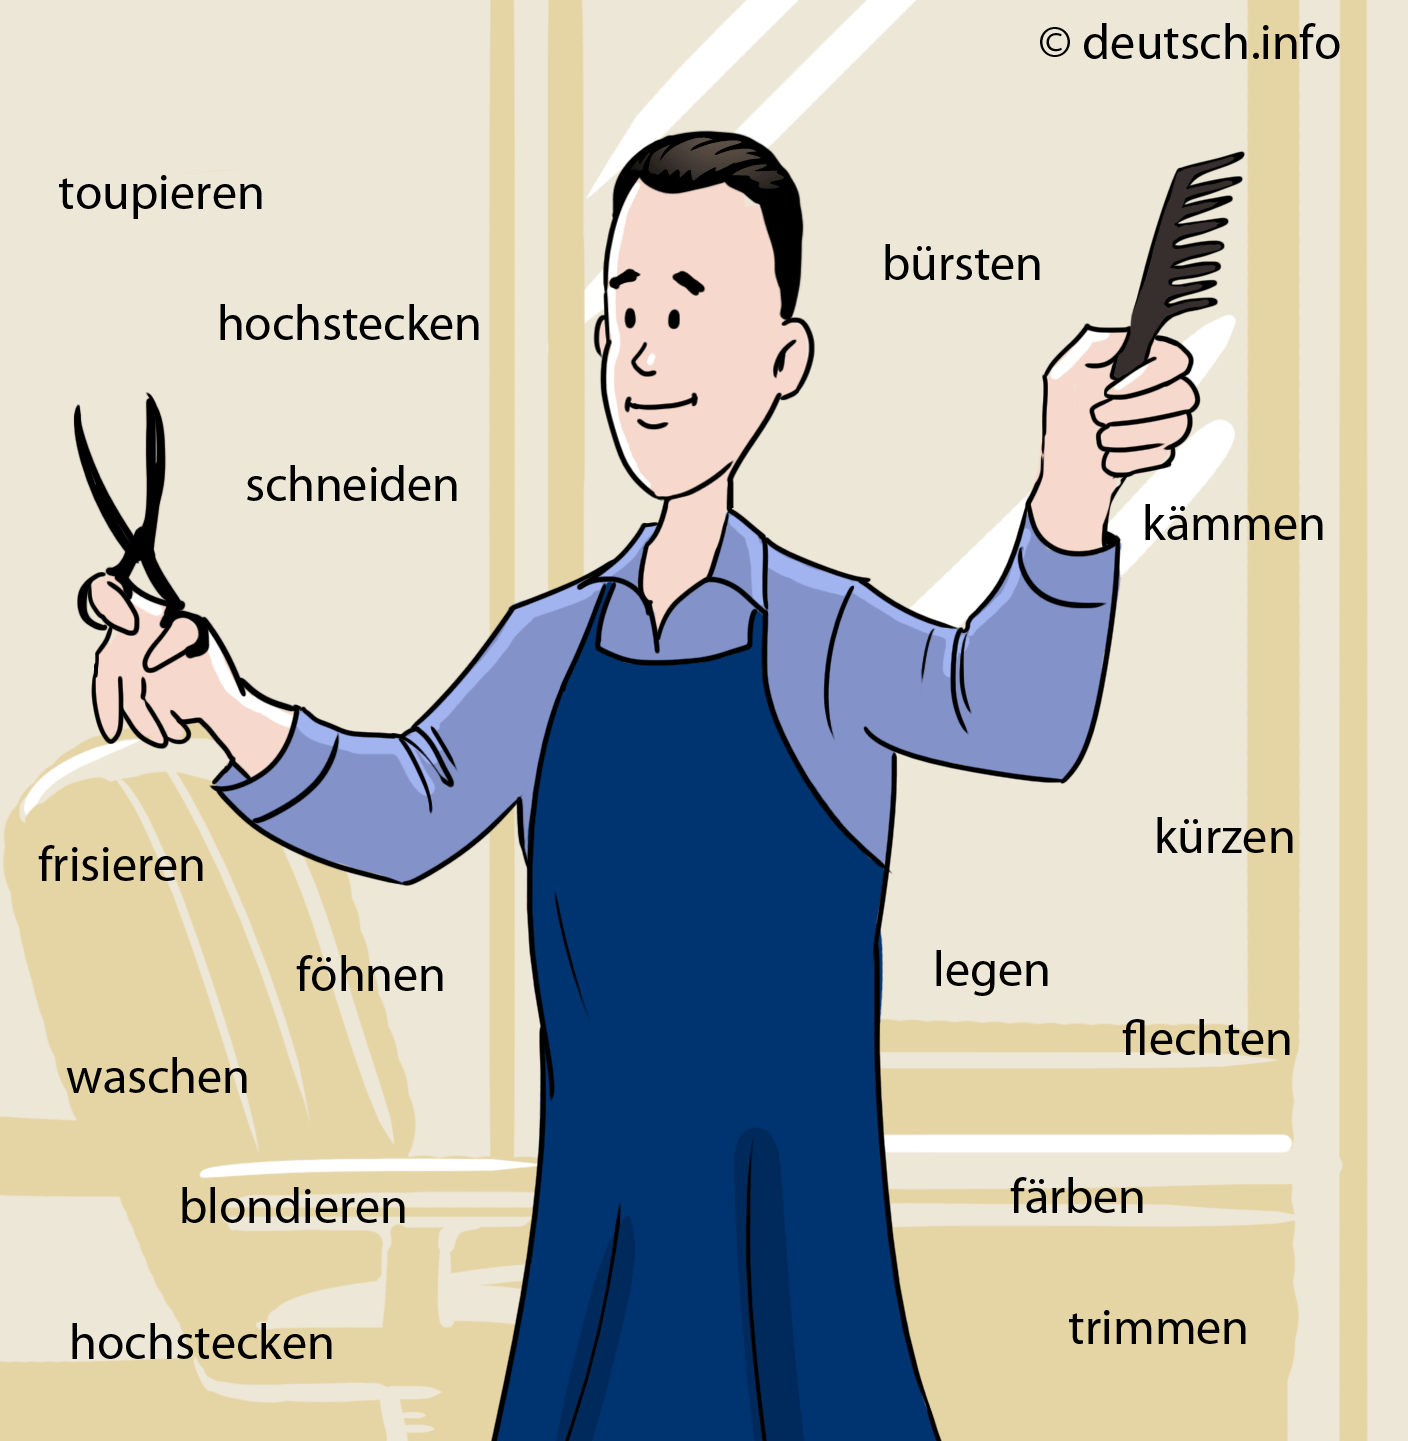 Der Friseur